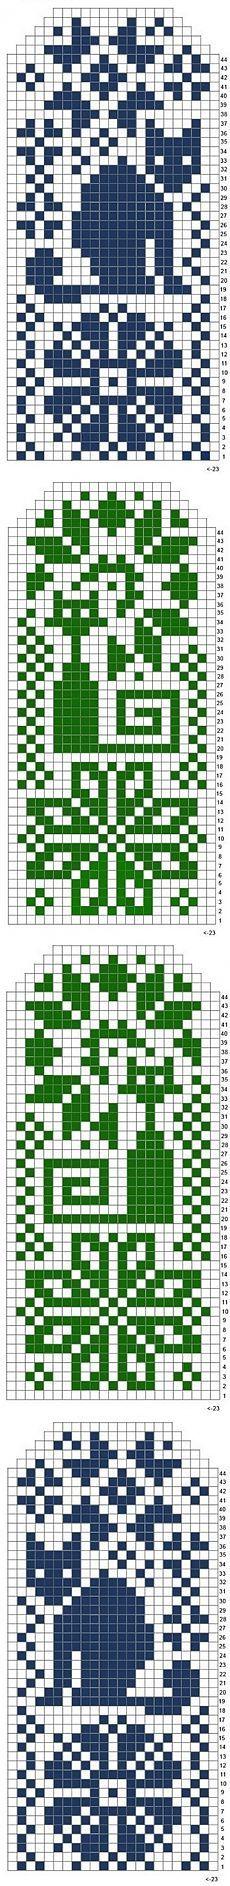 Схема узора для варежек спицами